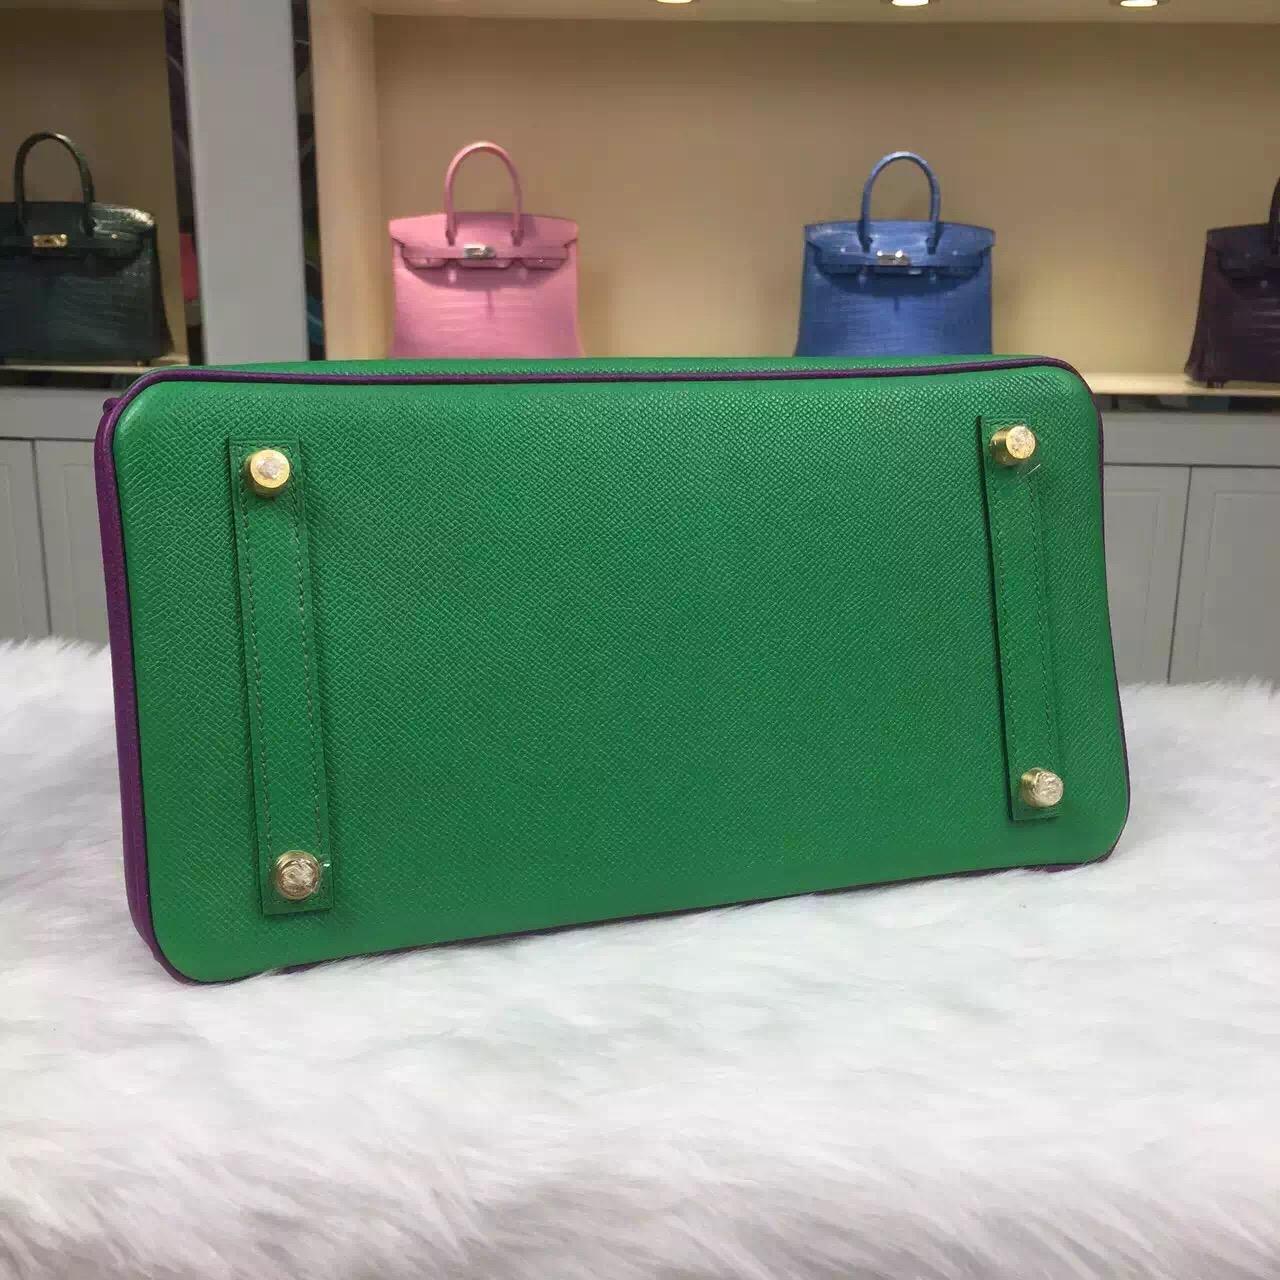 Wholesale Hermes Epsom Leather Birkin Bag 30CM 1K Bamboo Green & P9 Anemone Purple